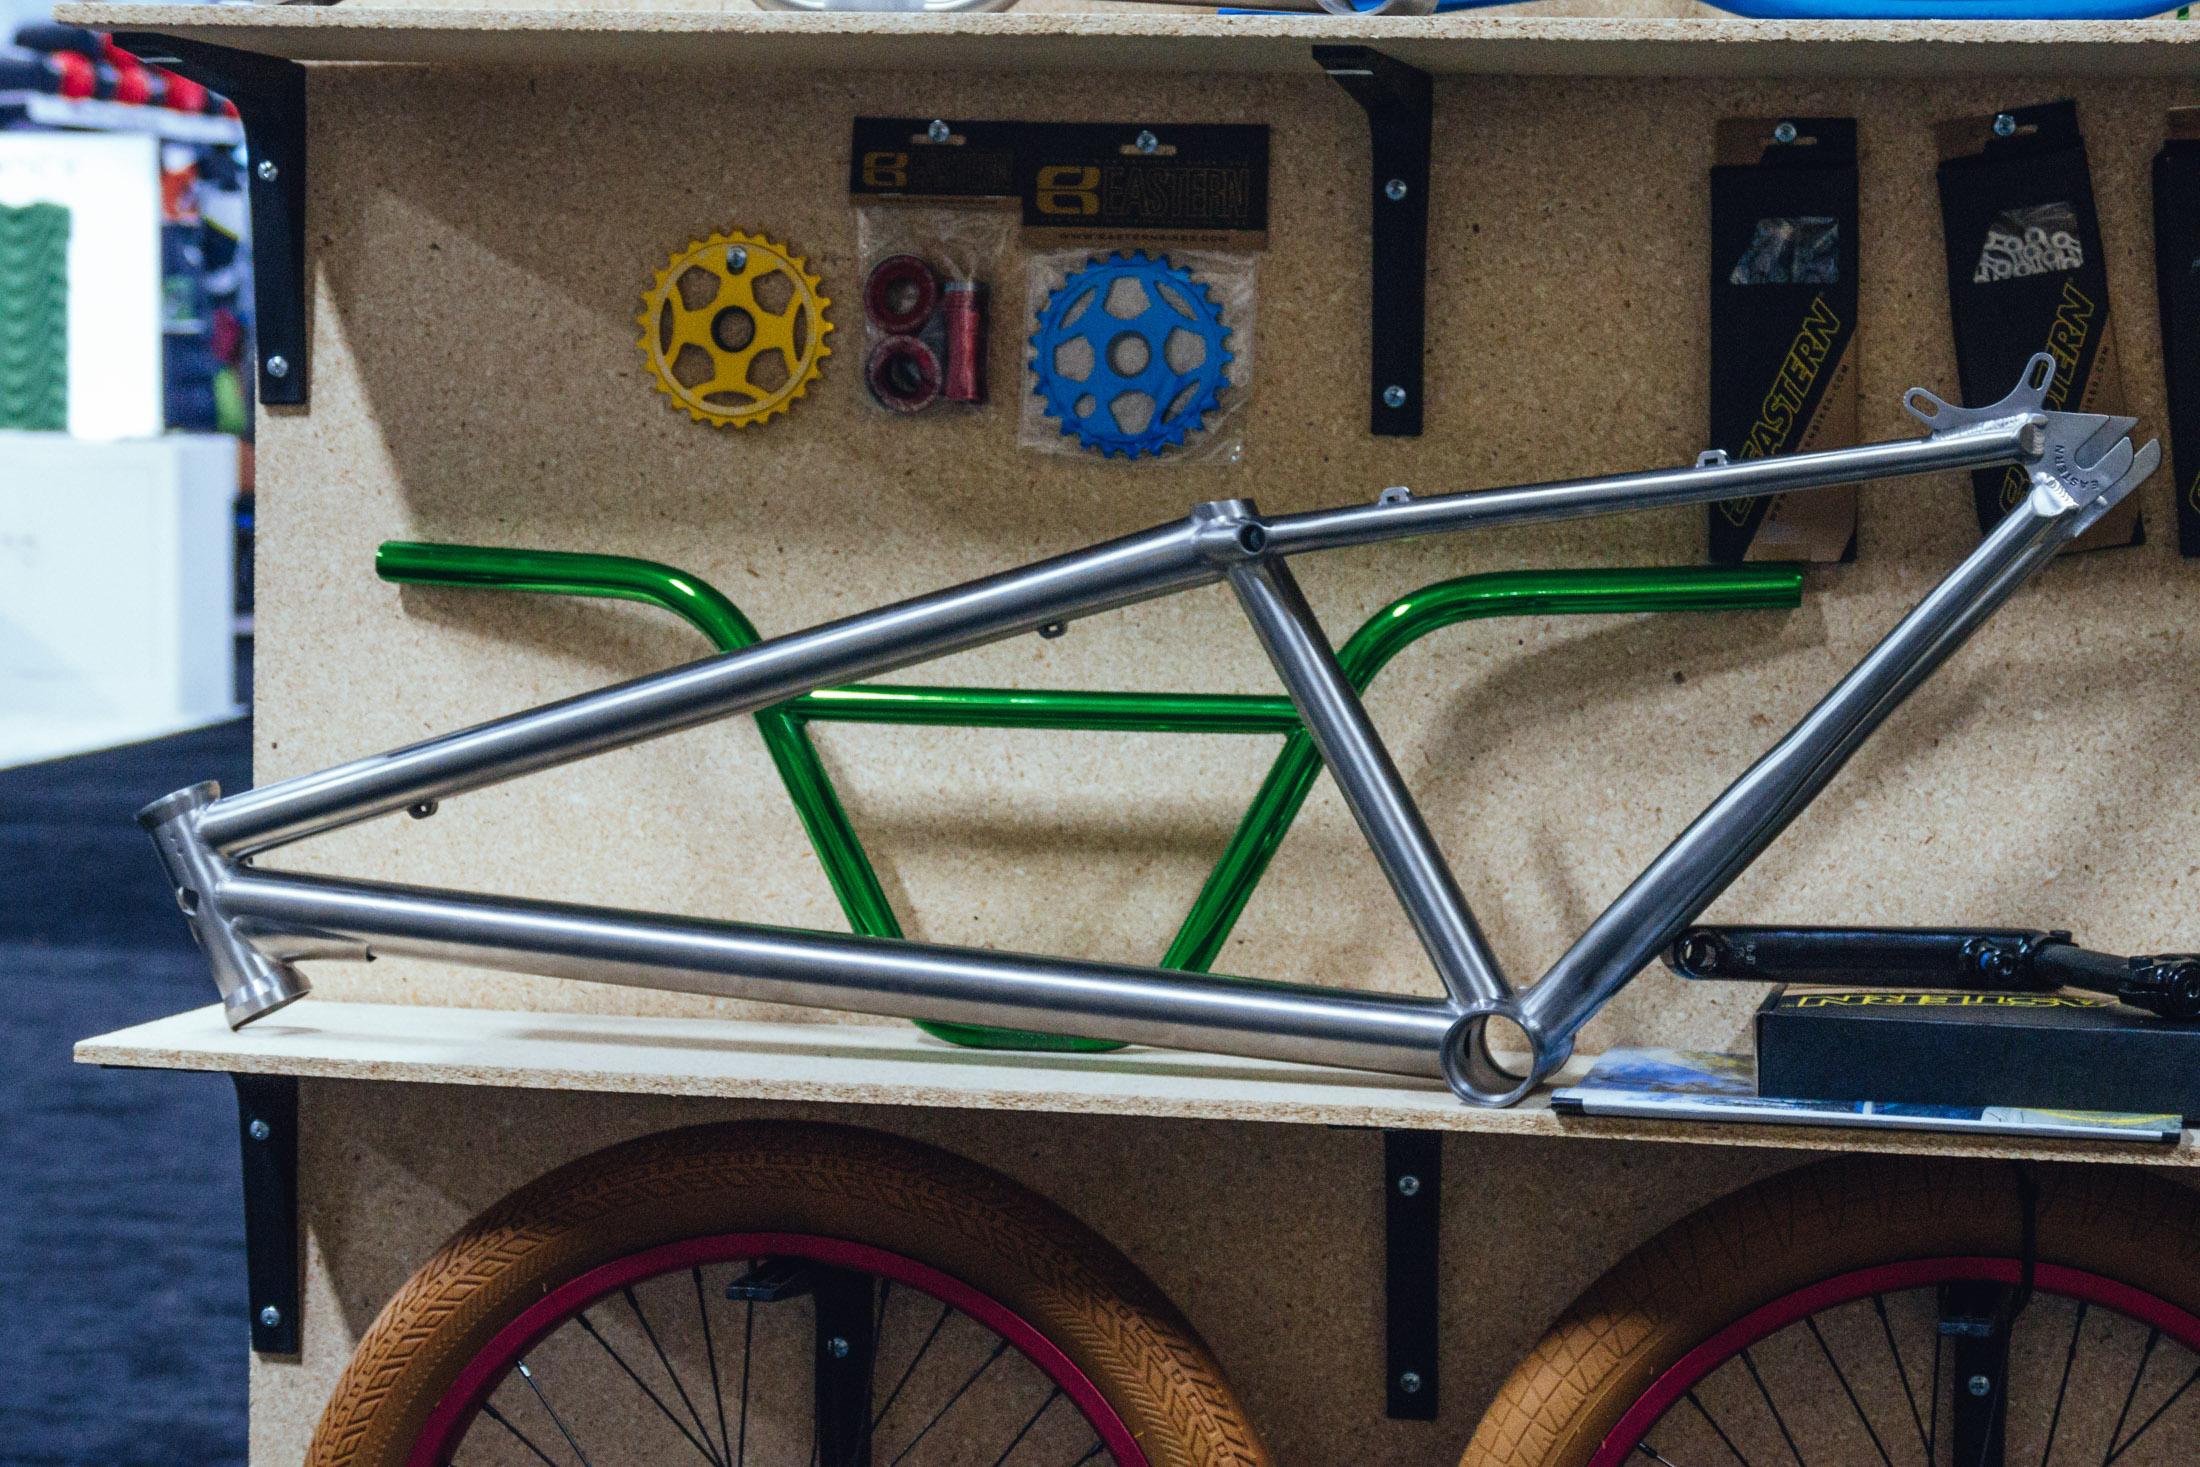 Eastern Nighttrain Titanium Dirt Jump Frame Interbike